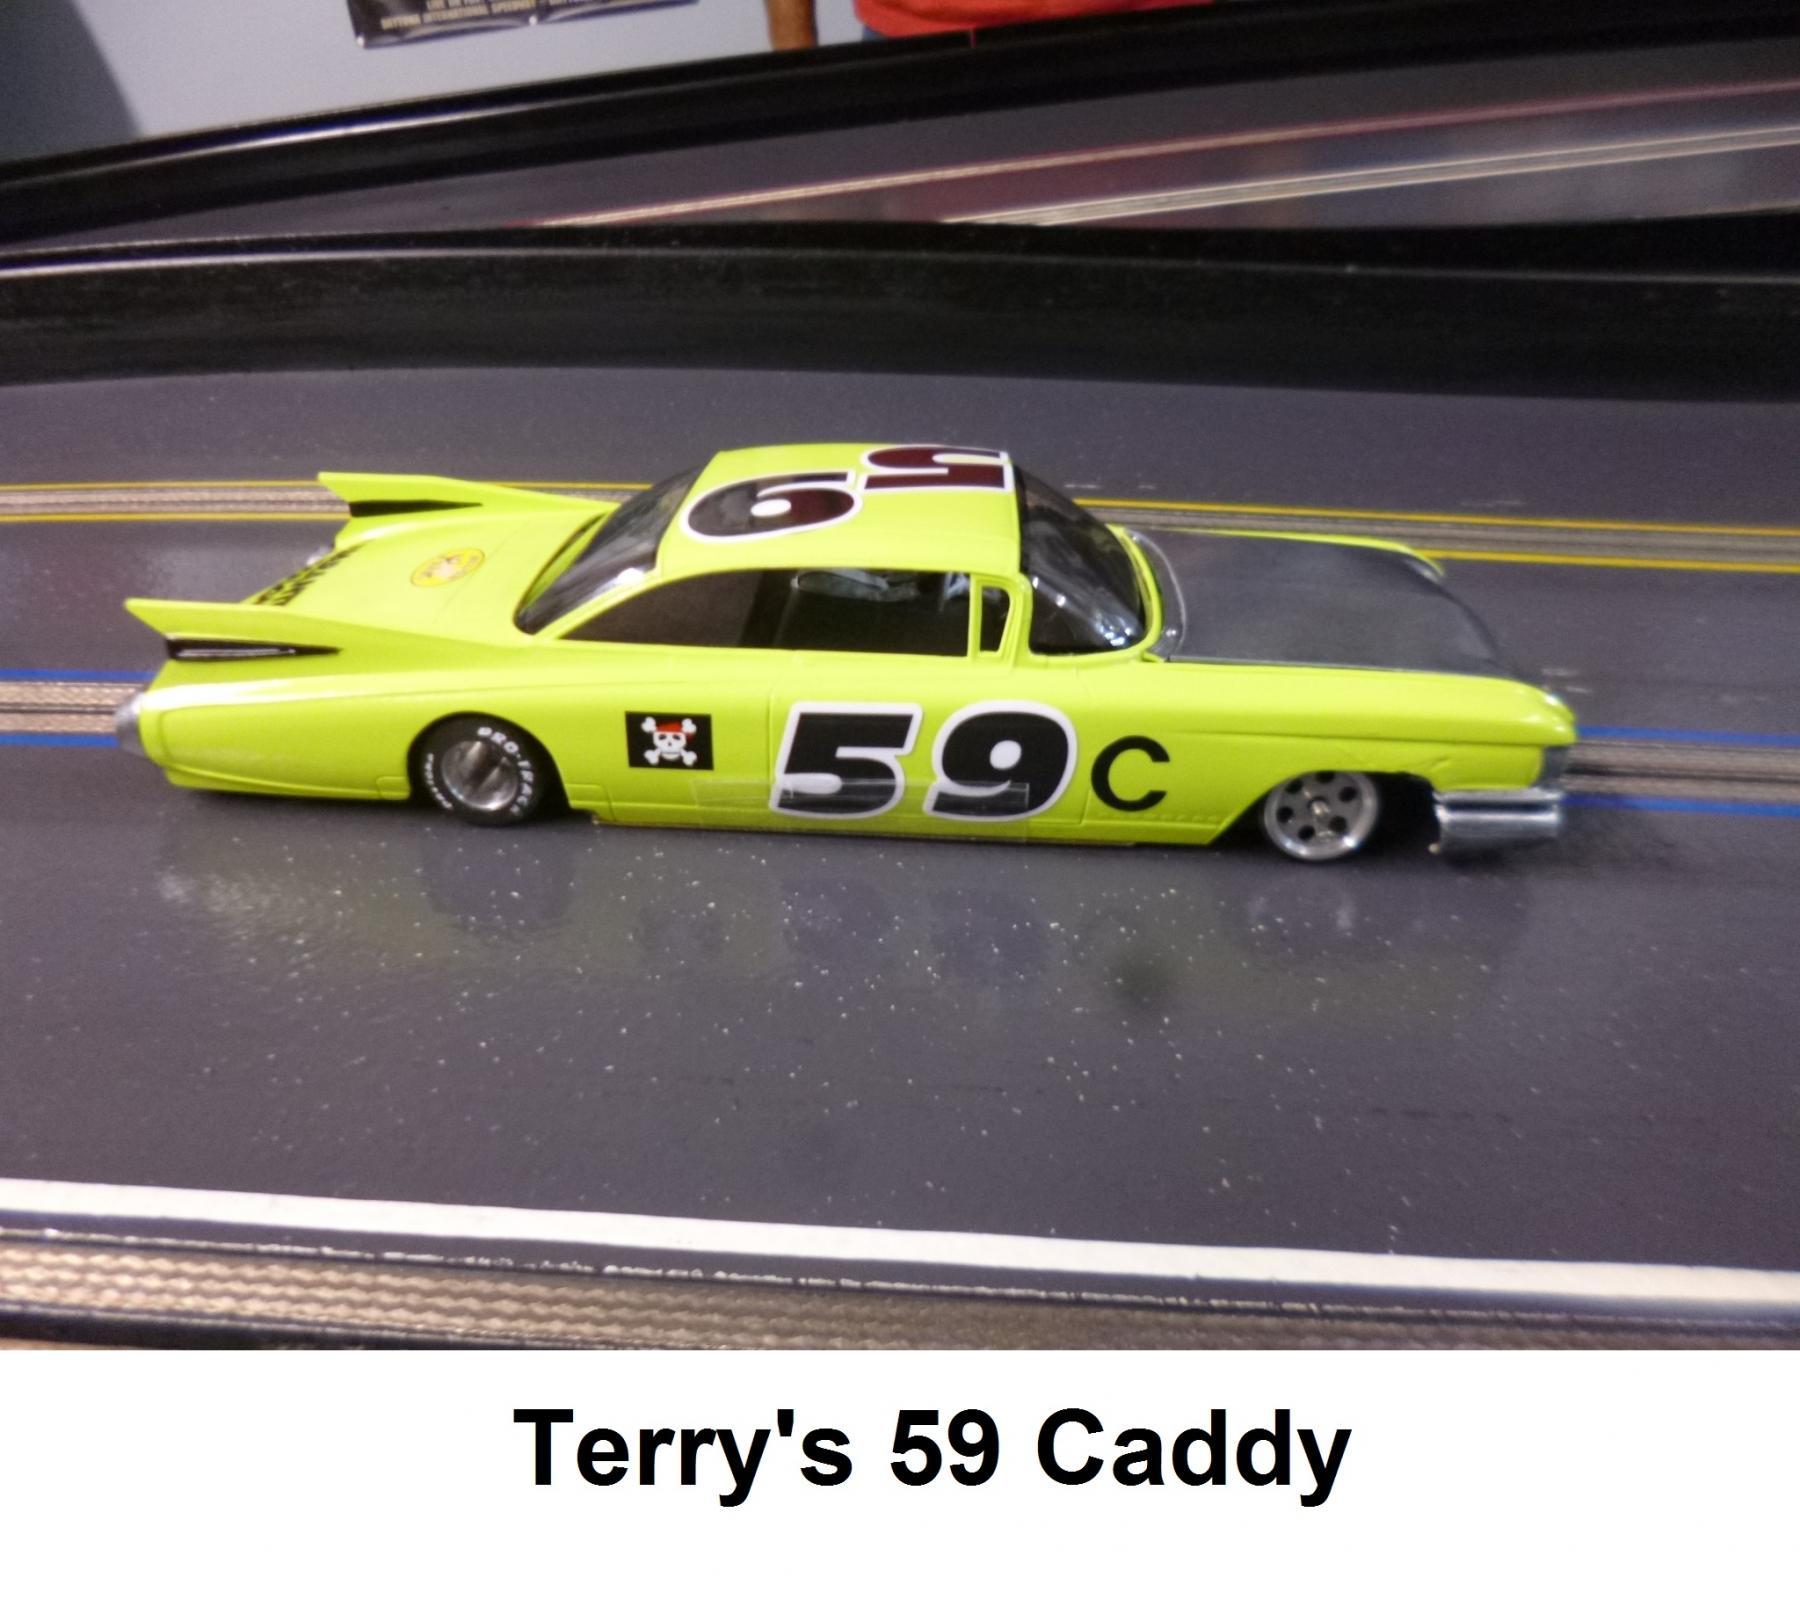 SS_Terry2.jpg